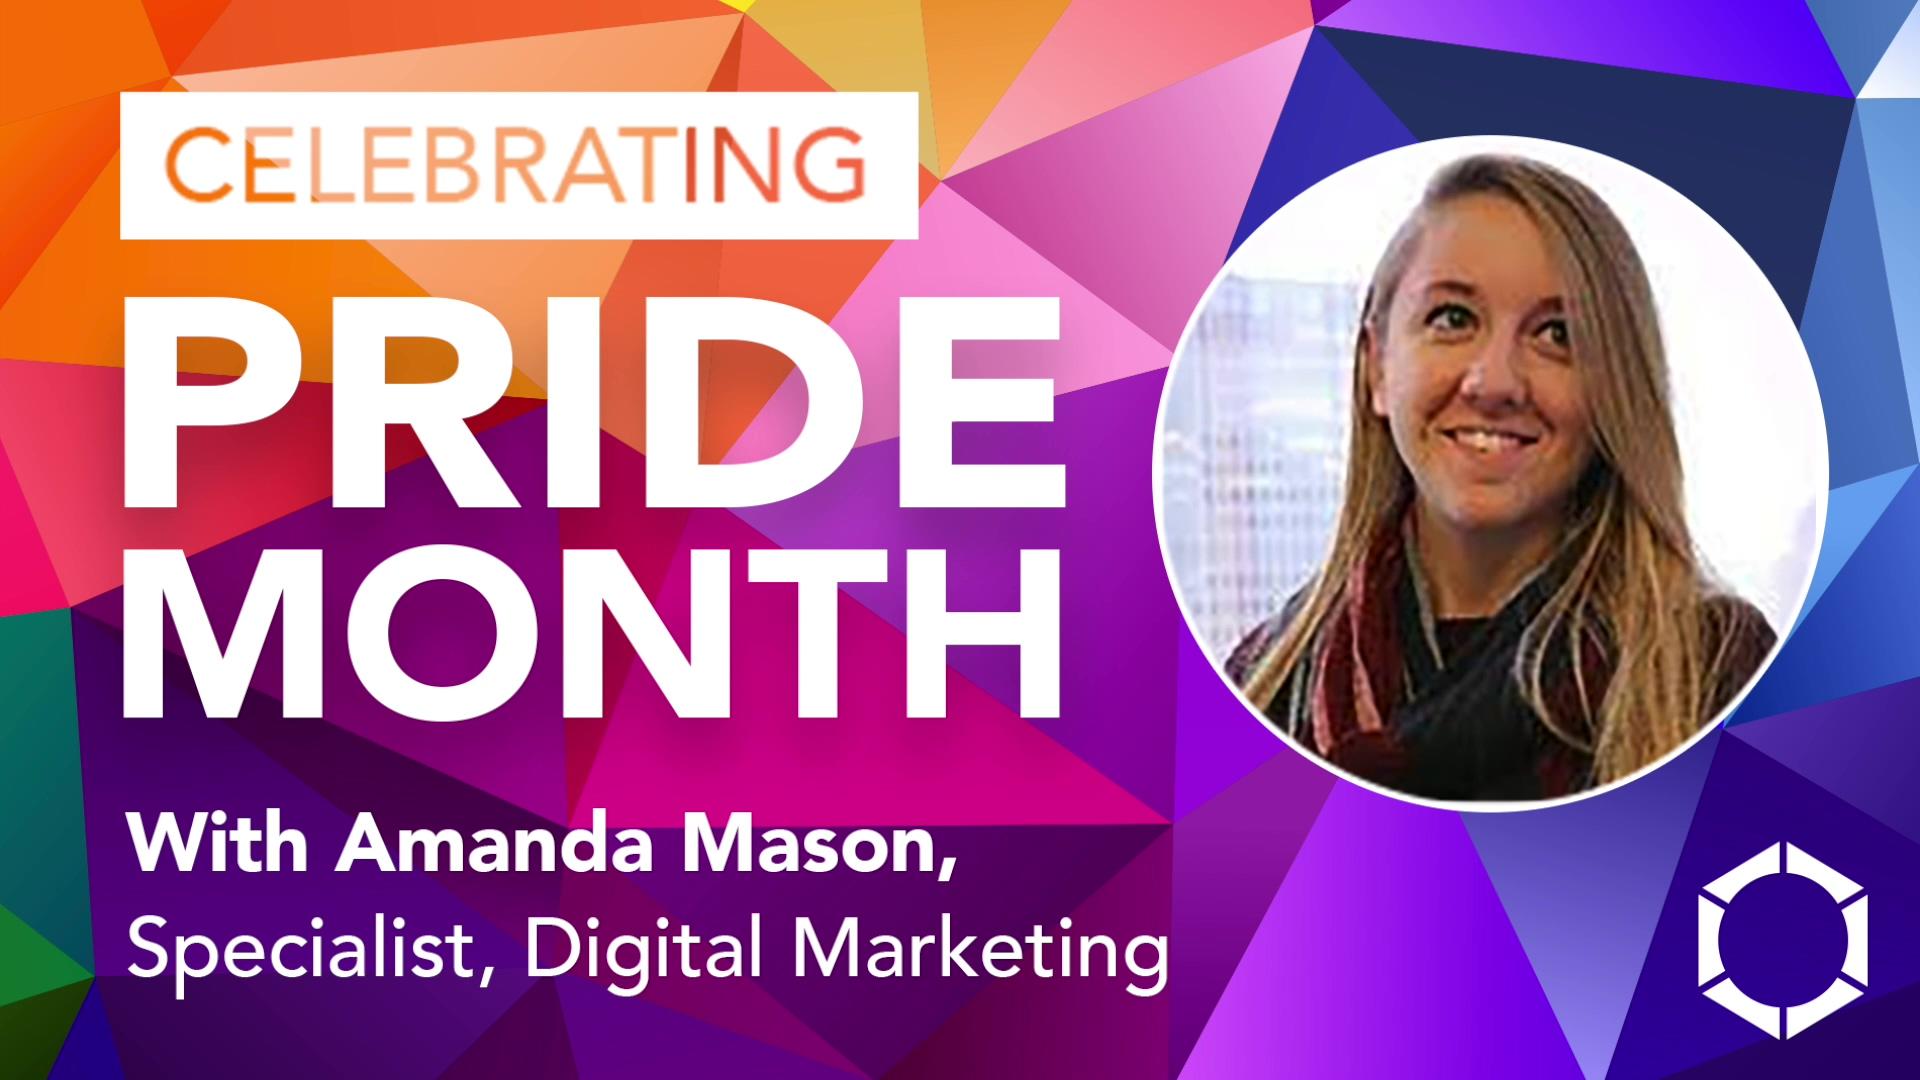 D&Z Celebrates Pride Month With Amanda Mason